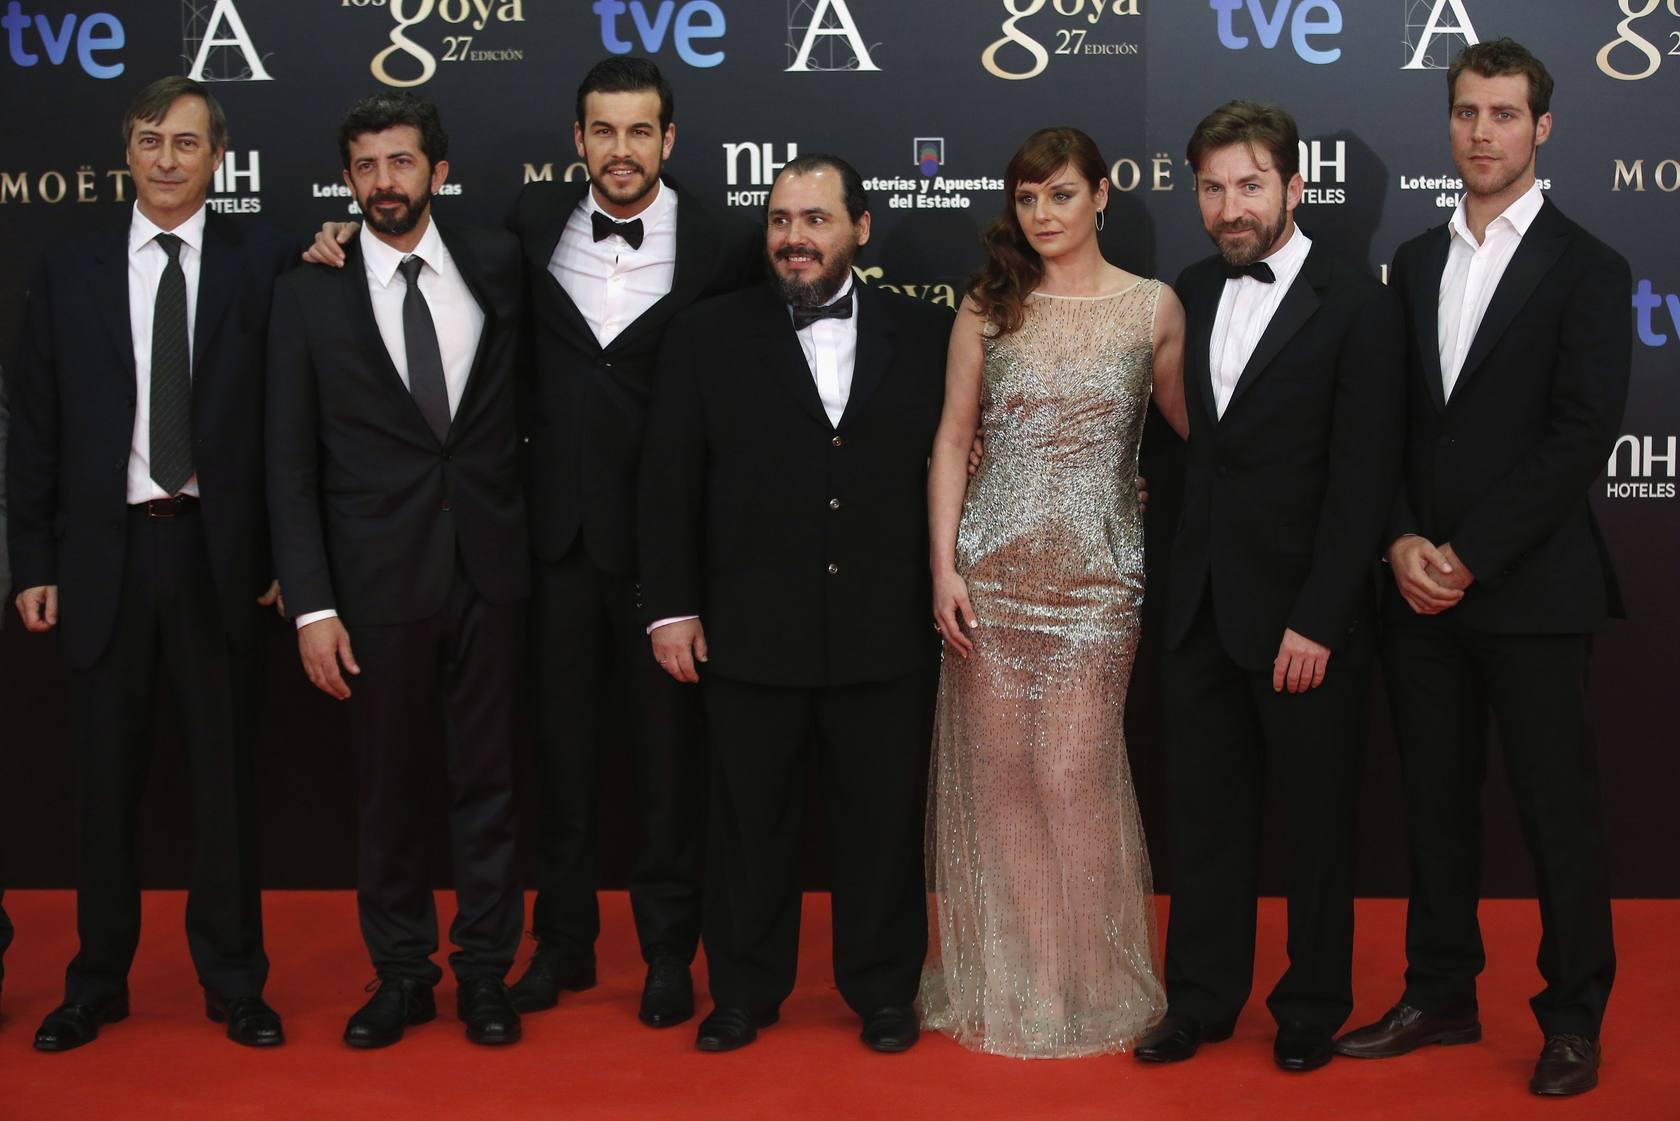 Premios Goya 2013: Joaquín Núñez, mejor actor revelación